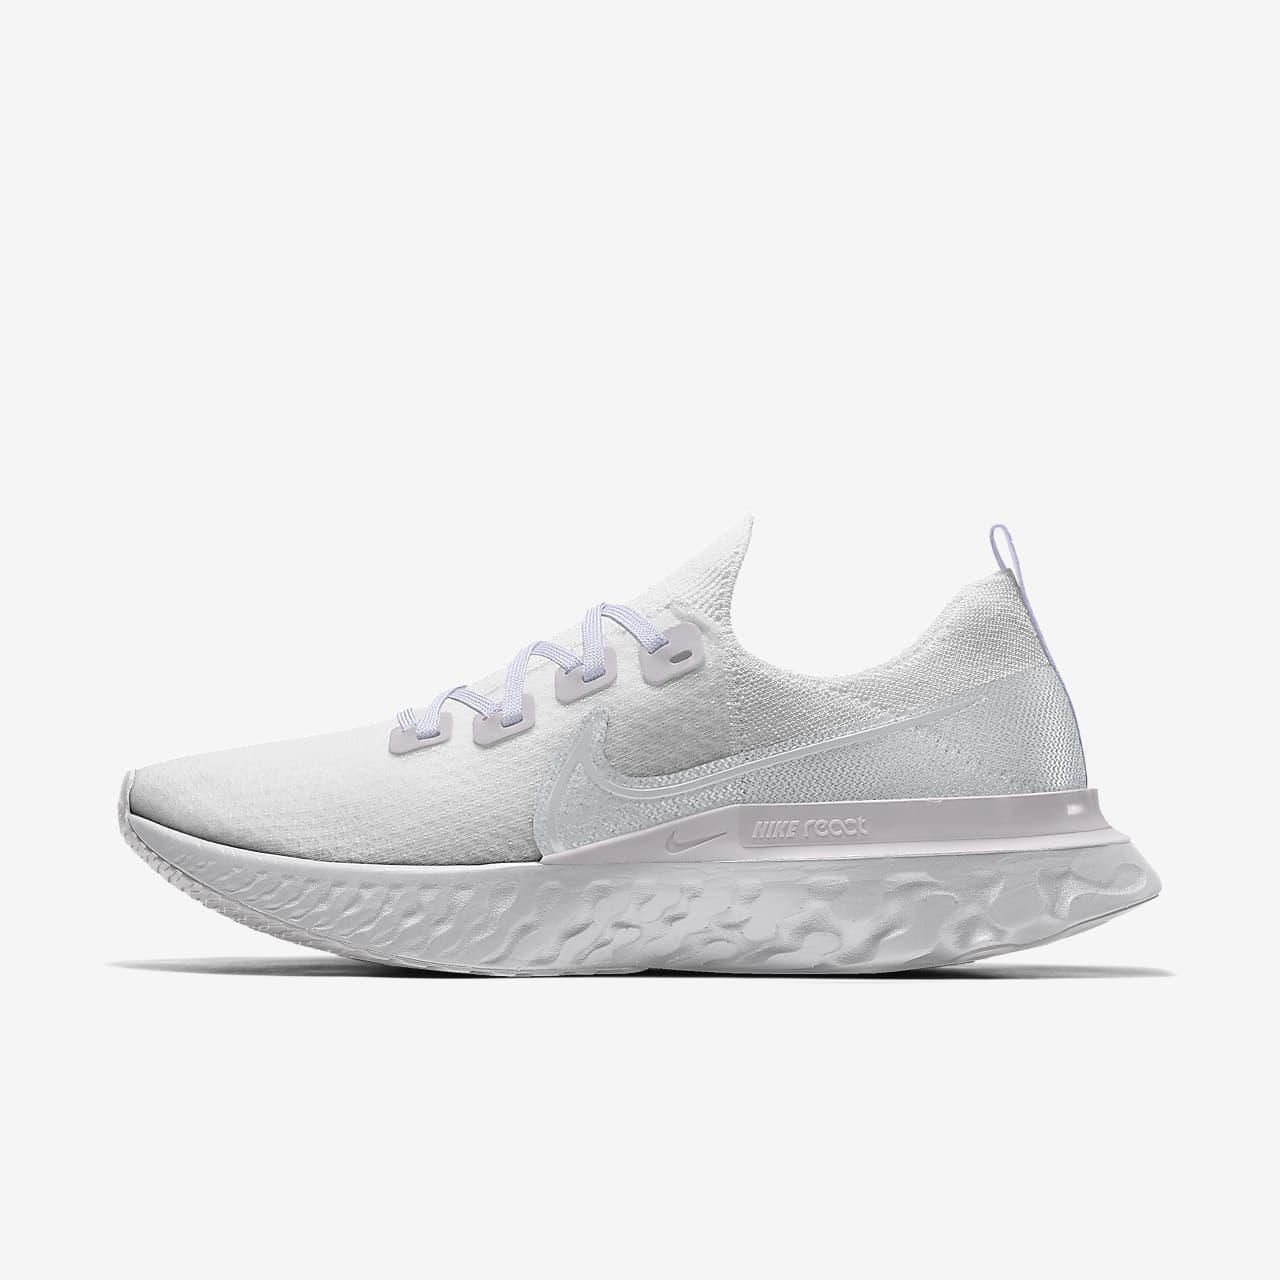 Nike React Infinity Run Flyknit By You personalisierbarer Herren-Laufschuh